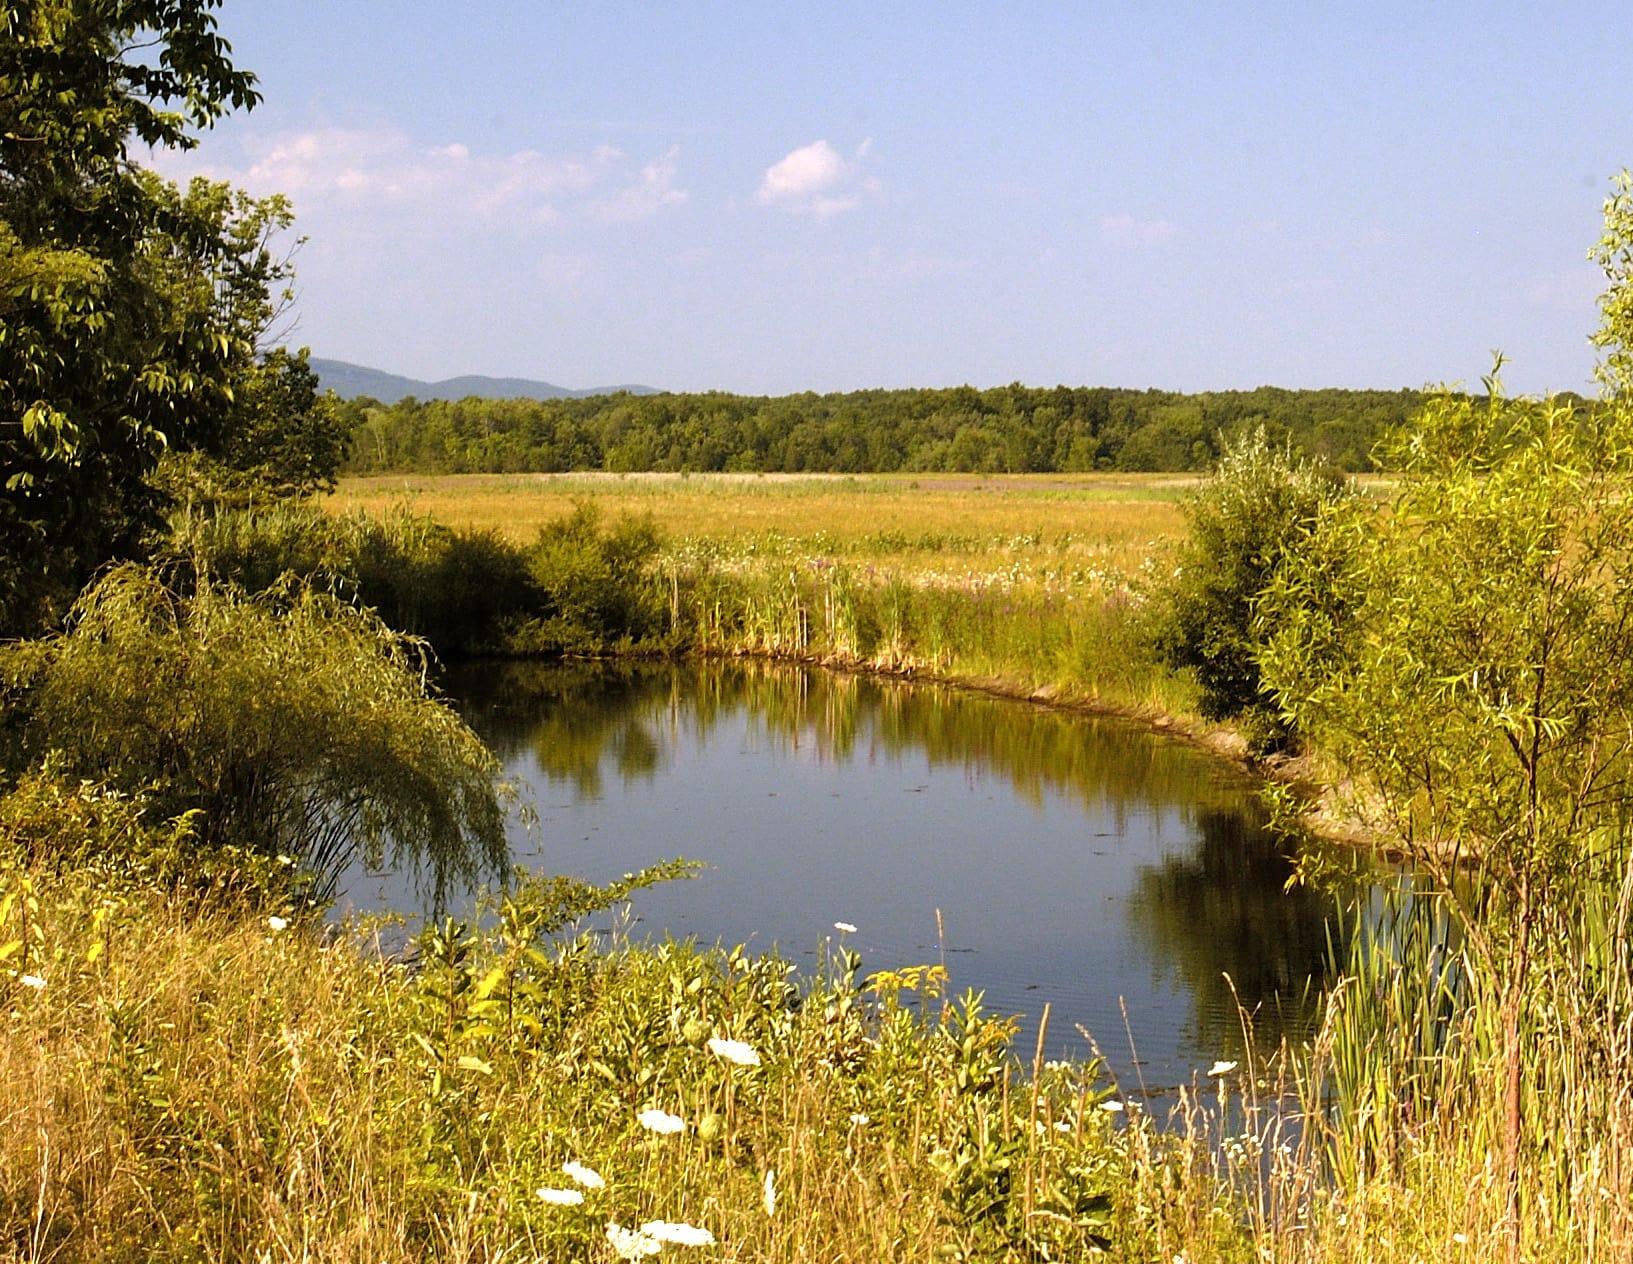 Shawagunk Grasslands National Wildlife Refuge